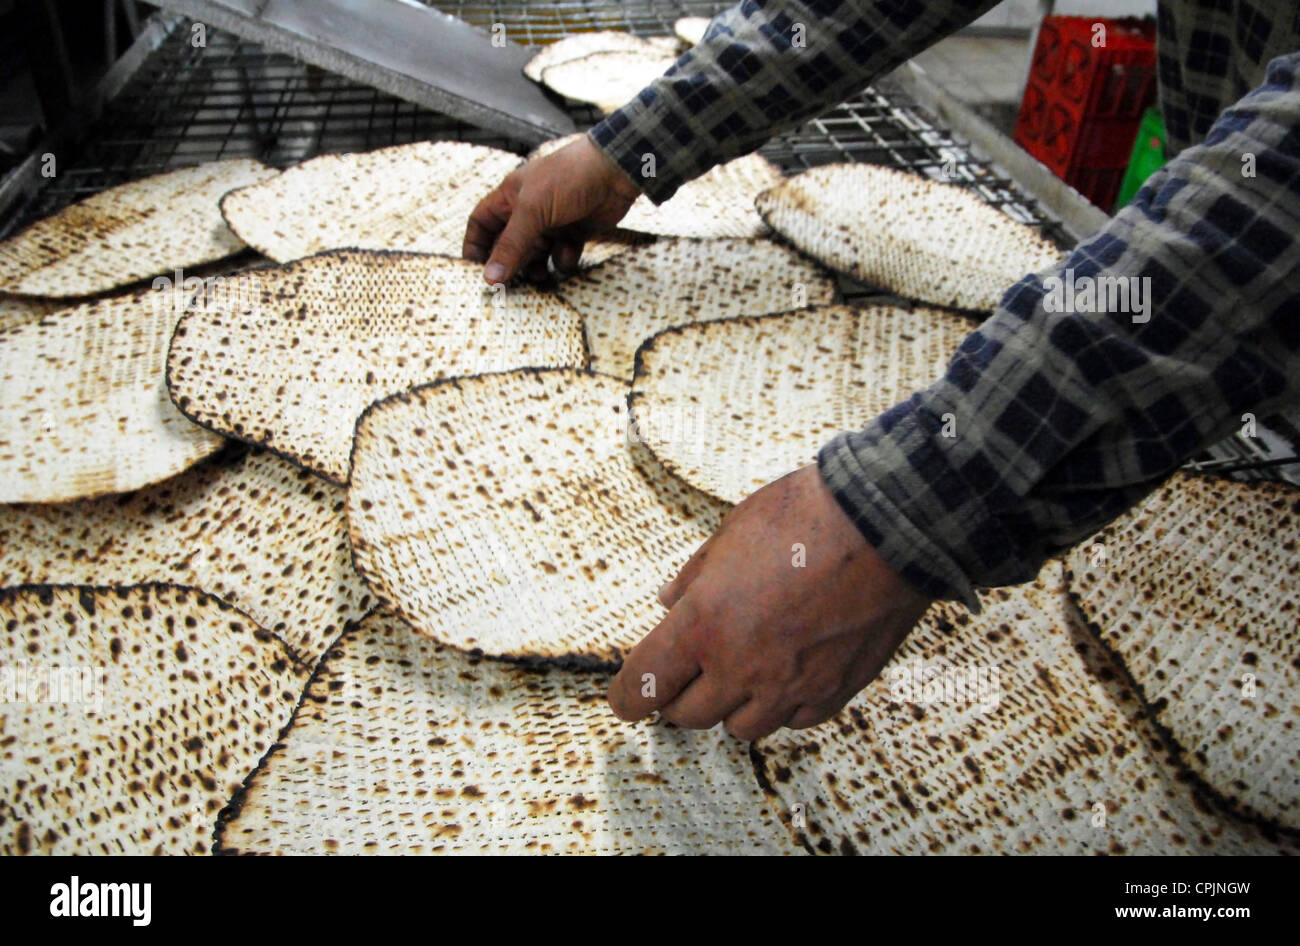 A hand-made glat kosher matzah at matzot factory for passover Jewish holy day. - Stock Image